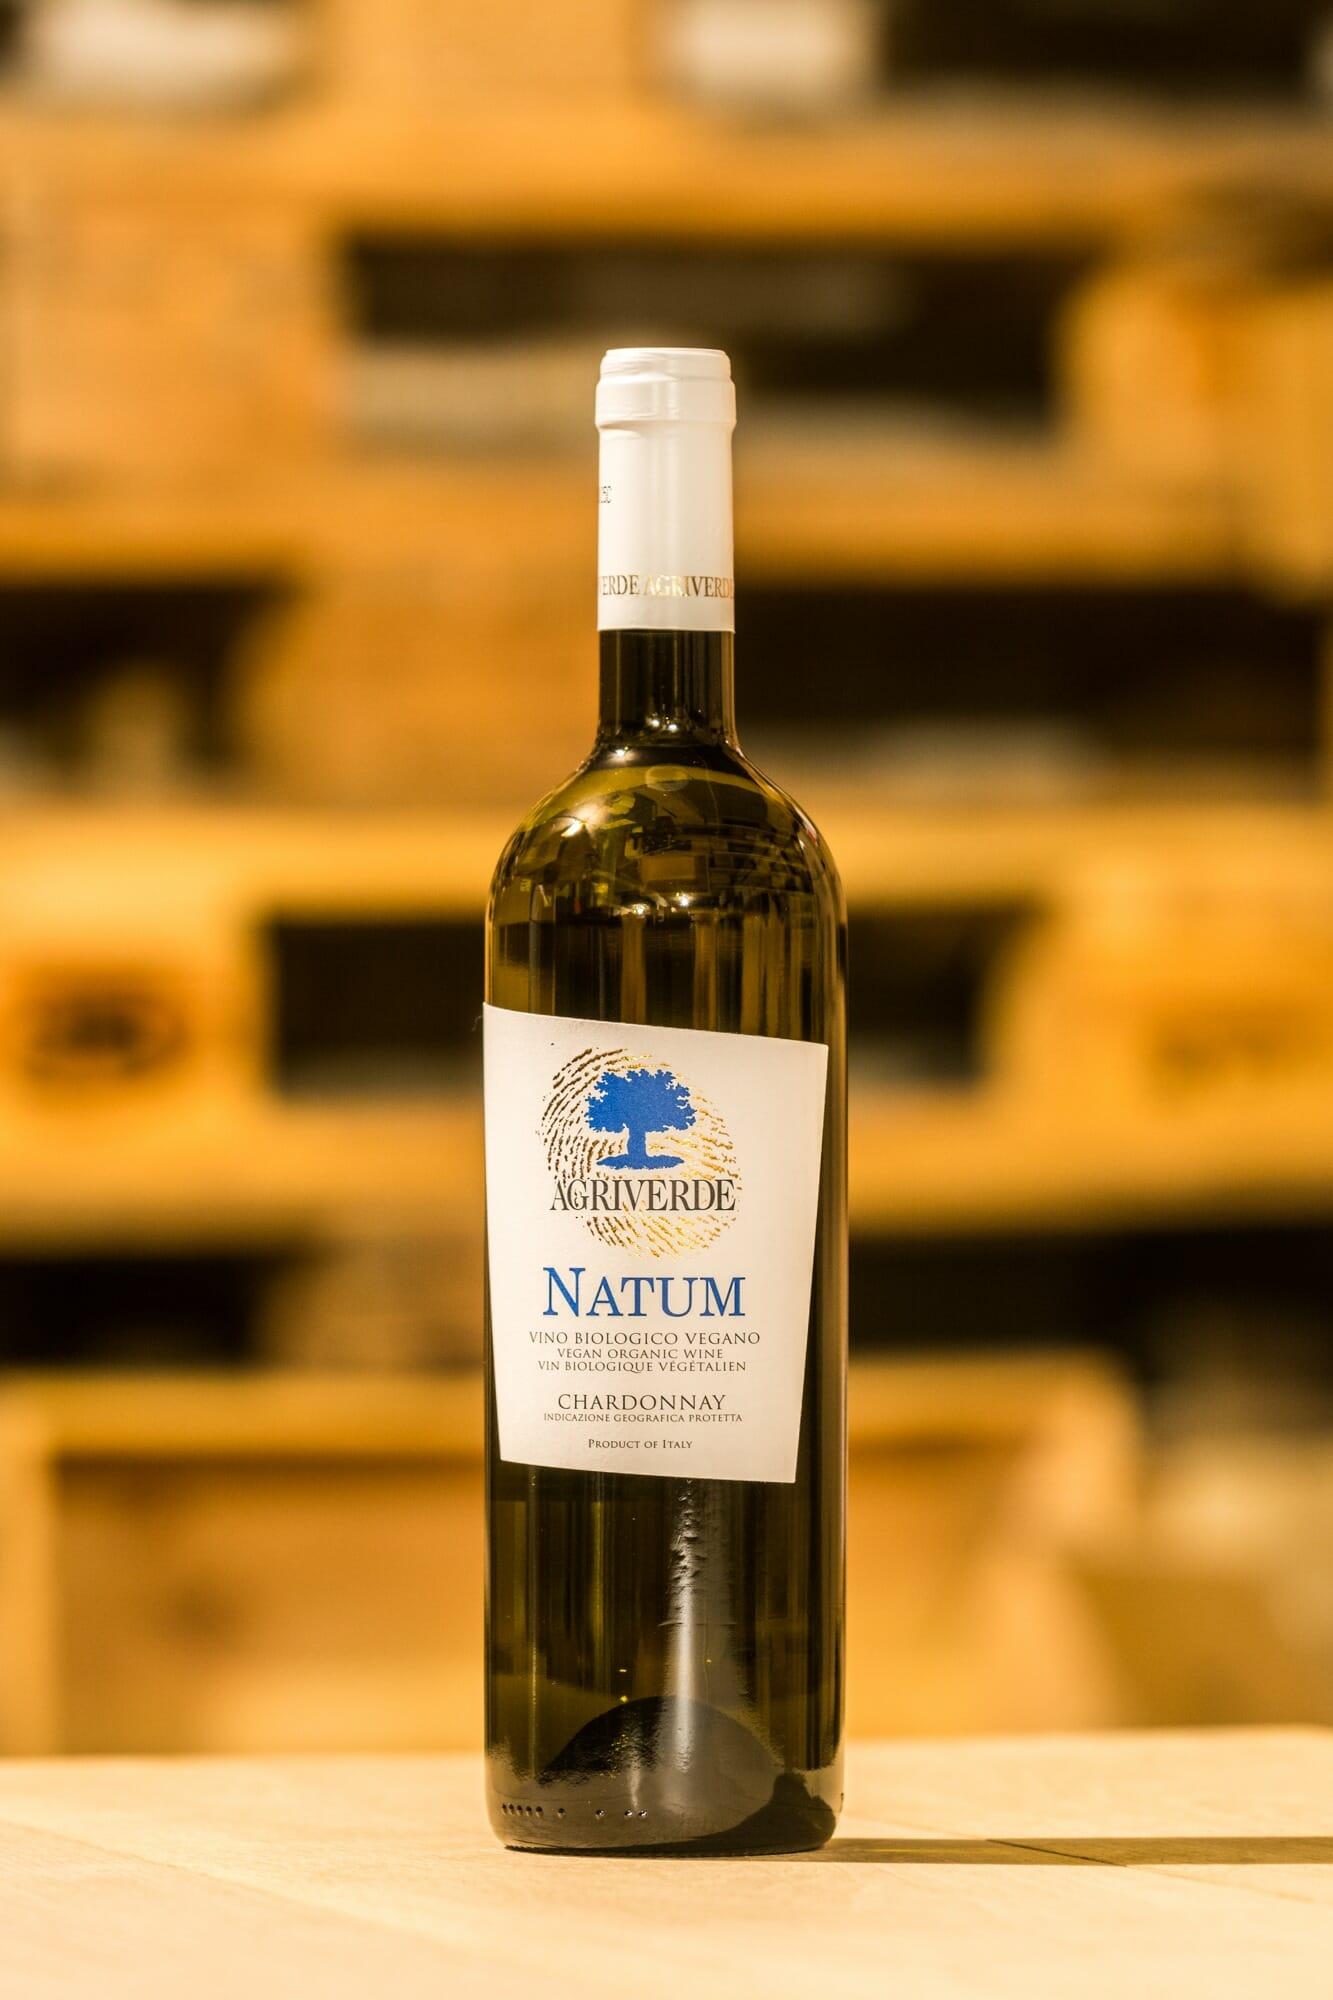 Agriverde Natum Chardonnay